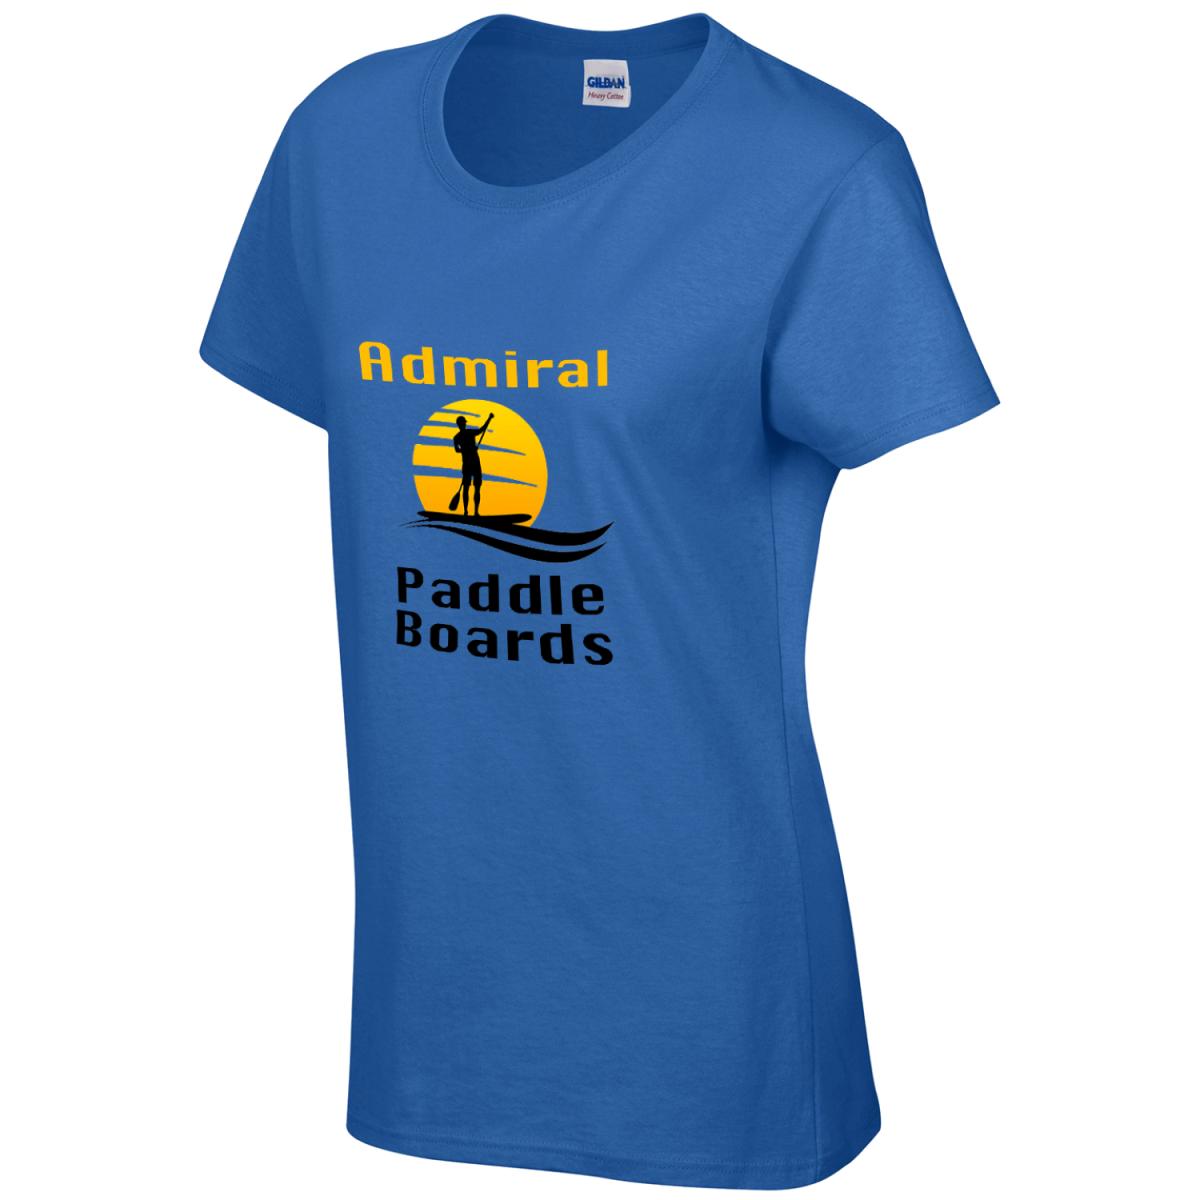 Custom Printed T-Shirt - Side Shot - Paddle Board